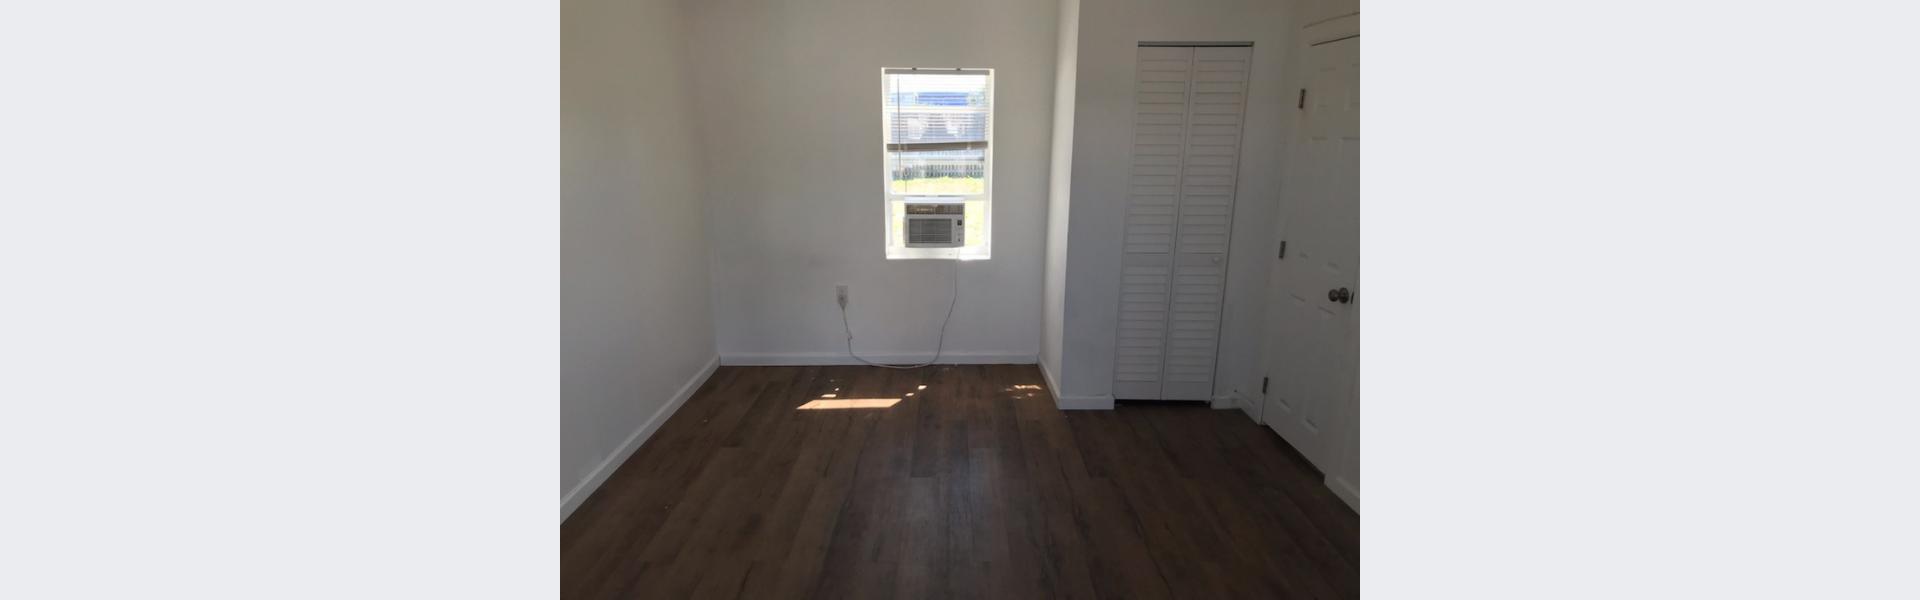 Affordable Cottage Studio located in 55+ Bedrock Ocean Tide